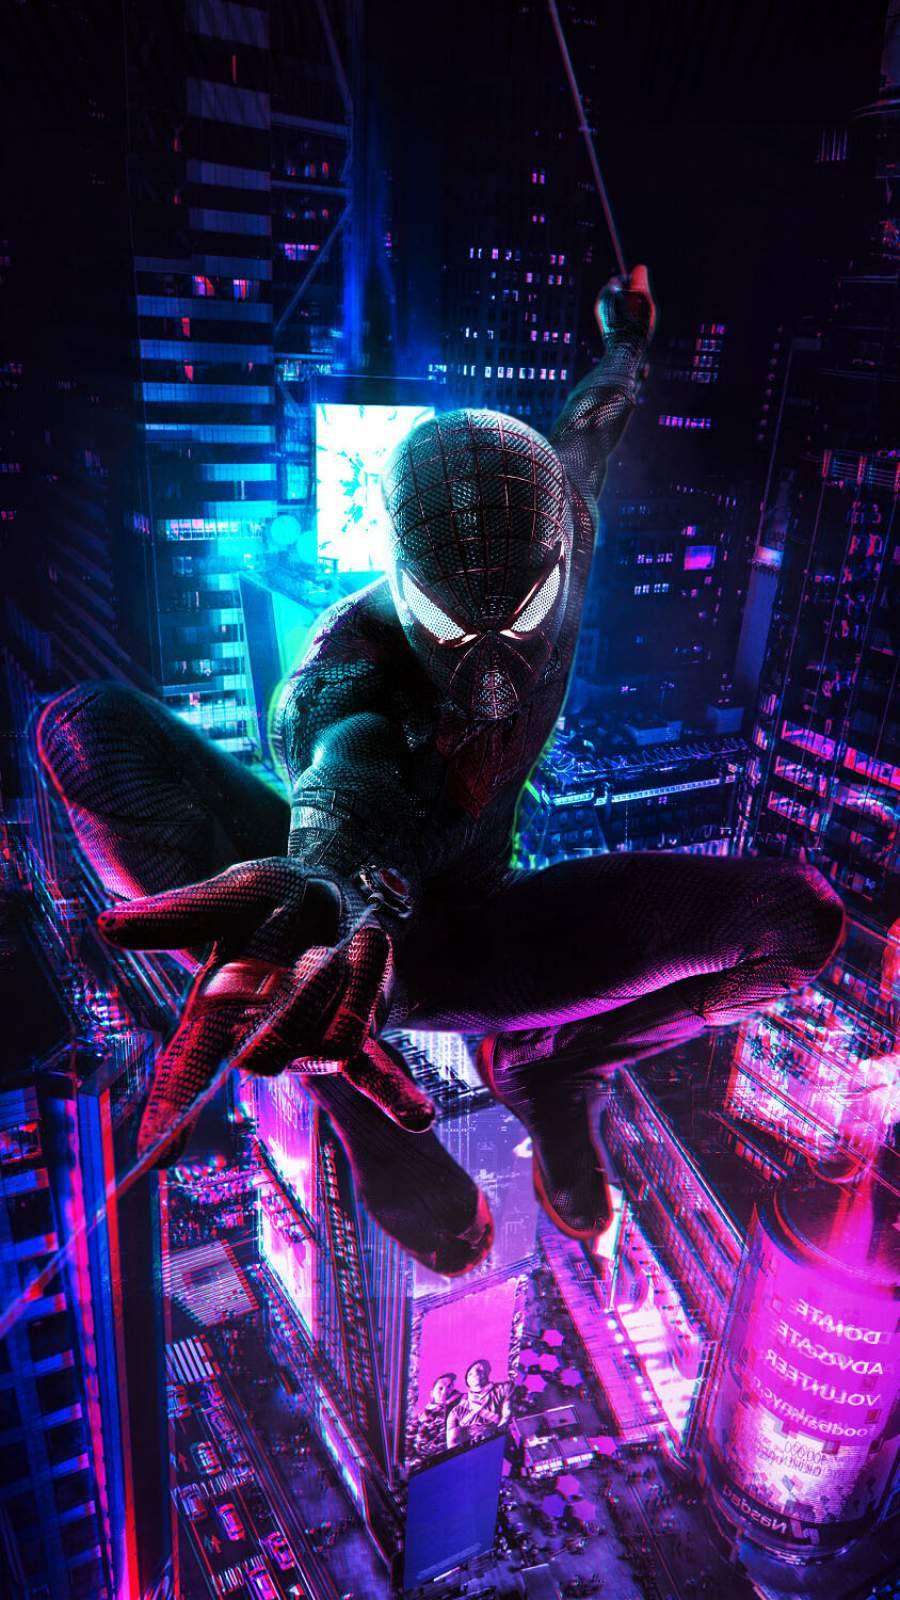 Spiderman Cyberpunk iPhone Wallpaper - iPhone Wallpapers ...